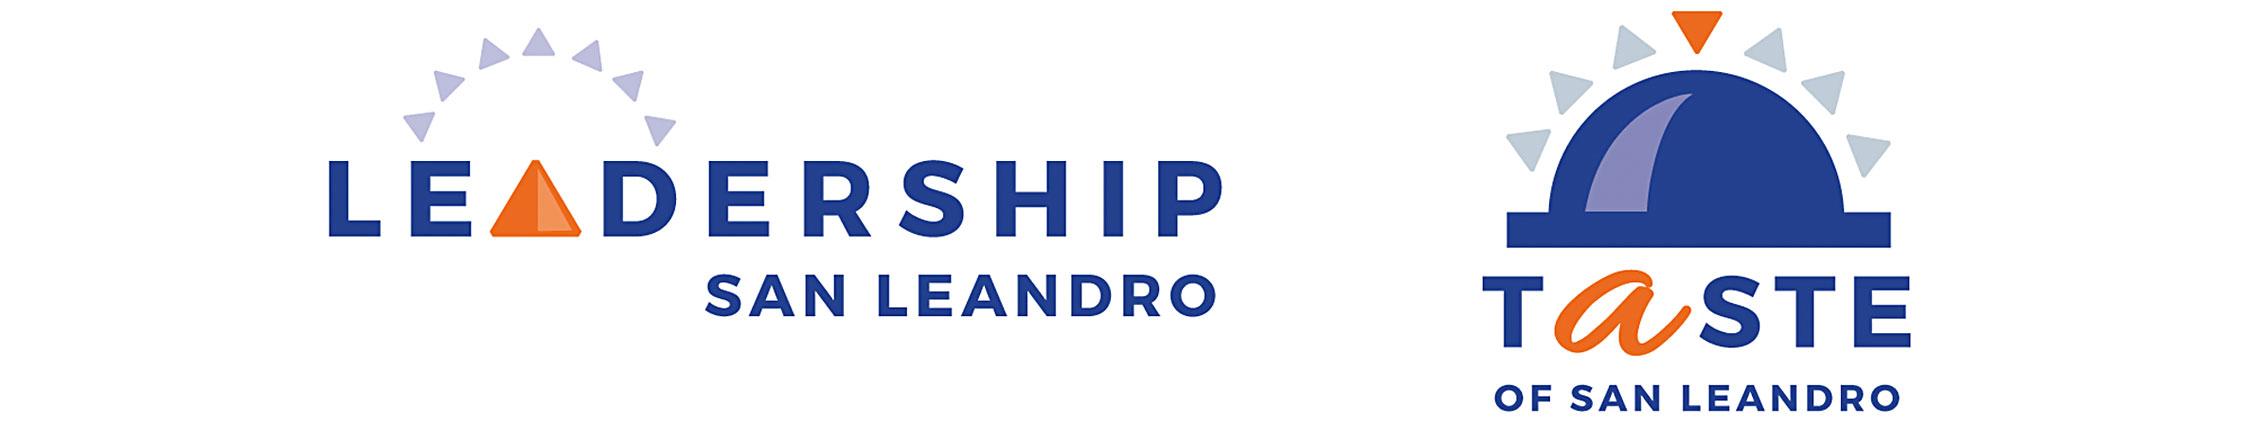 Brandora_Collective_Taste-of-San-Leandro_Logo-Design-3